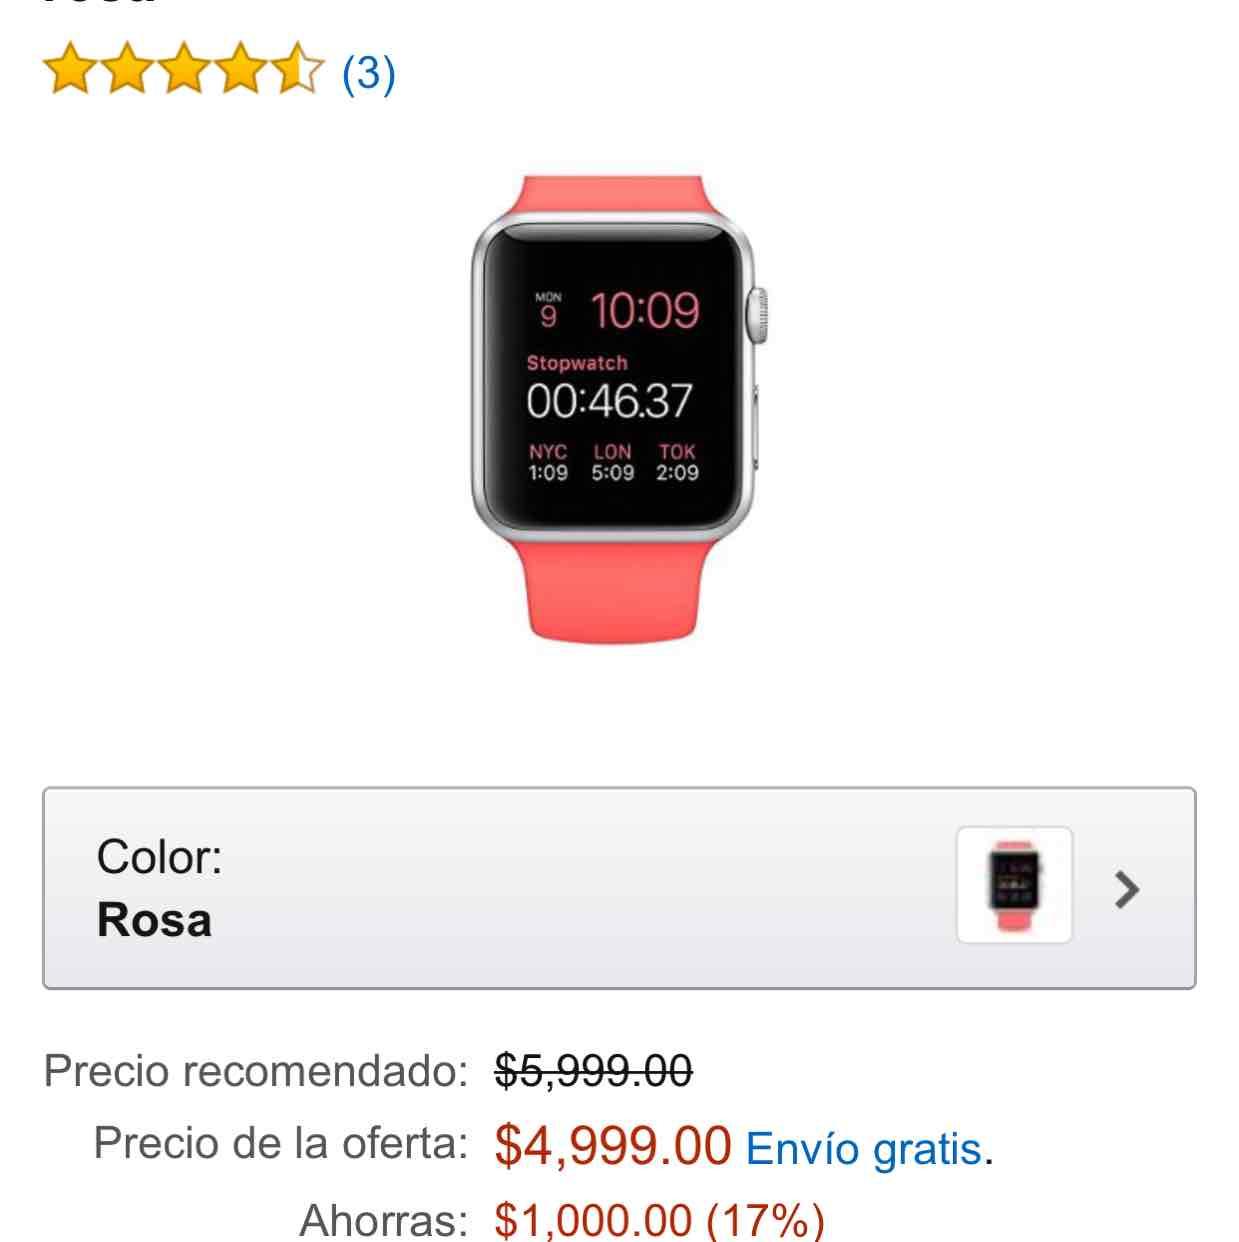 Amazon: Apple Watch 38 mm rosa $4,999 con Banorte $4,500